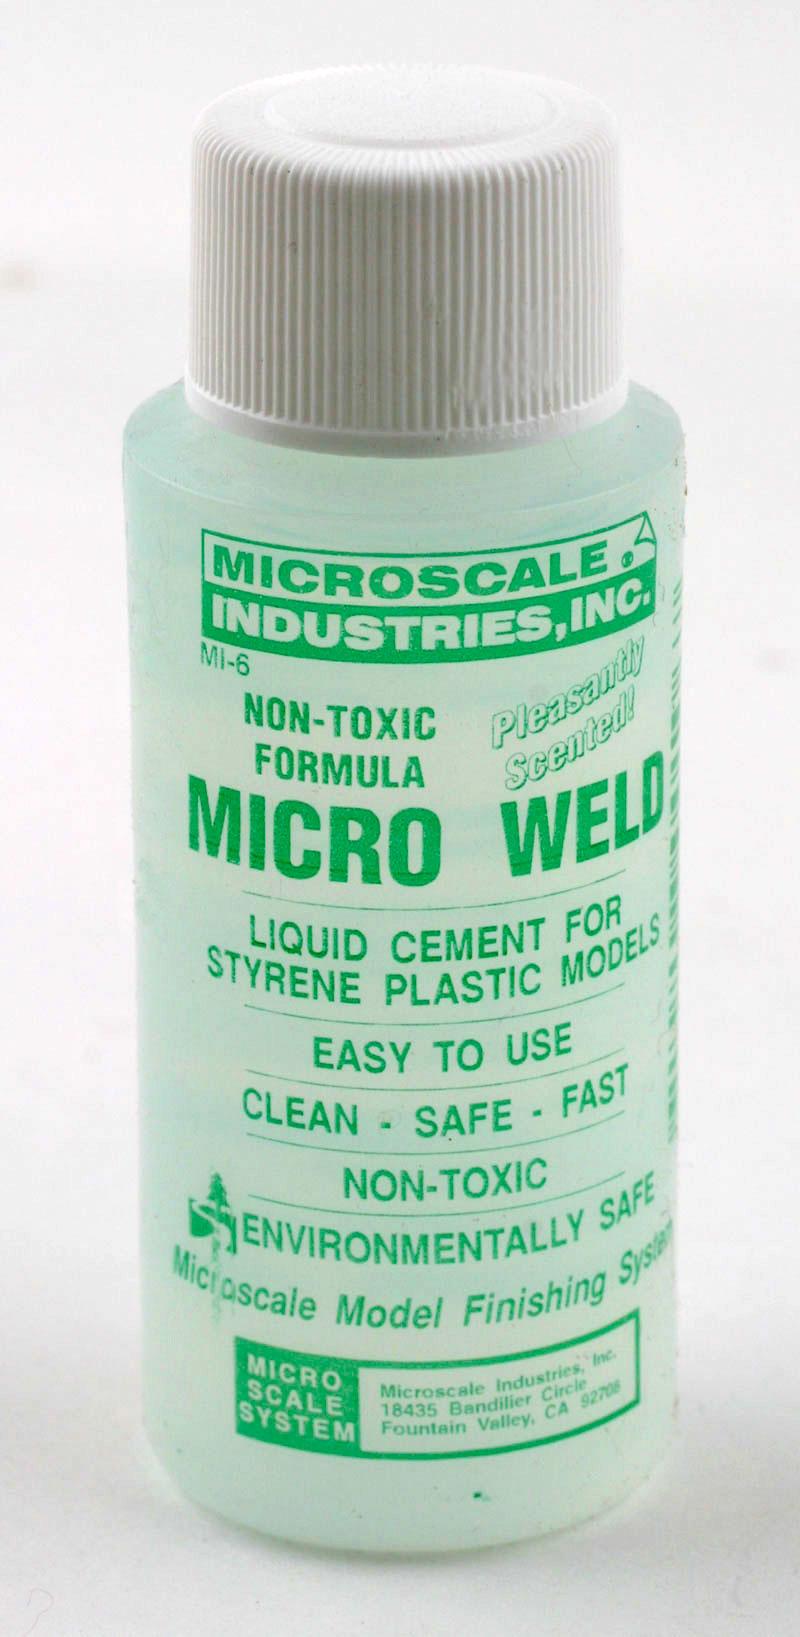 MicroWeld new formula